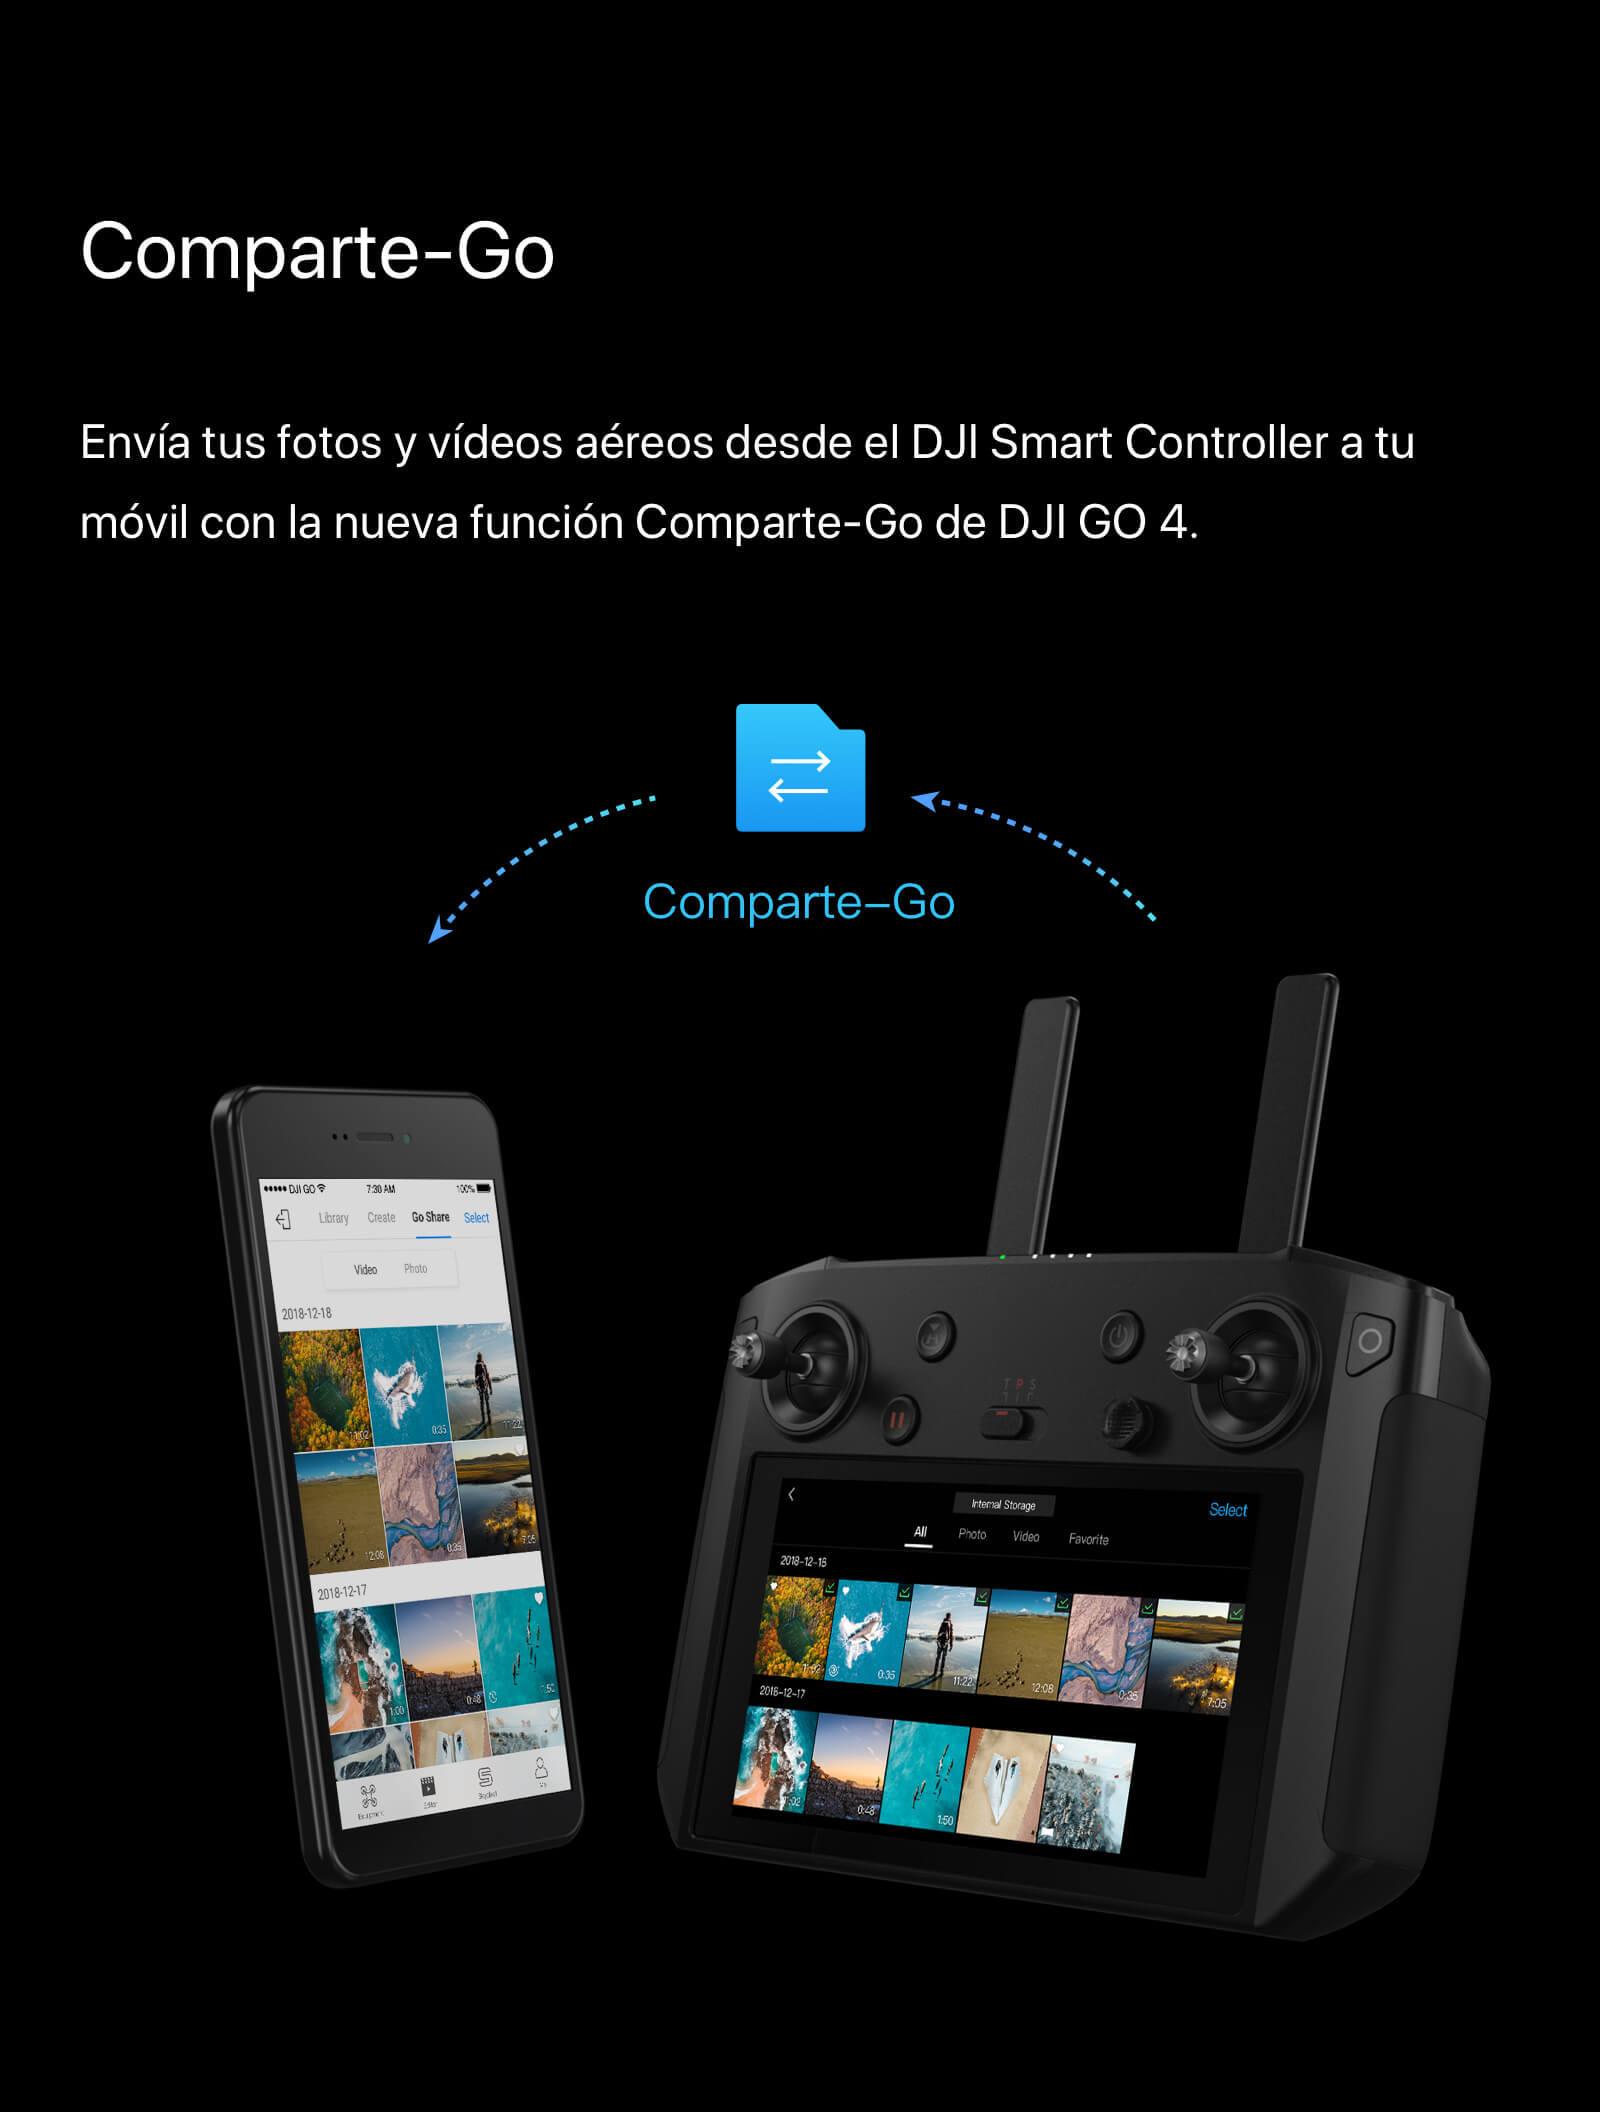 dji_smart_controller_stockrc5